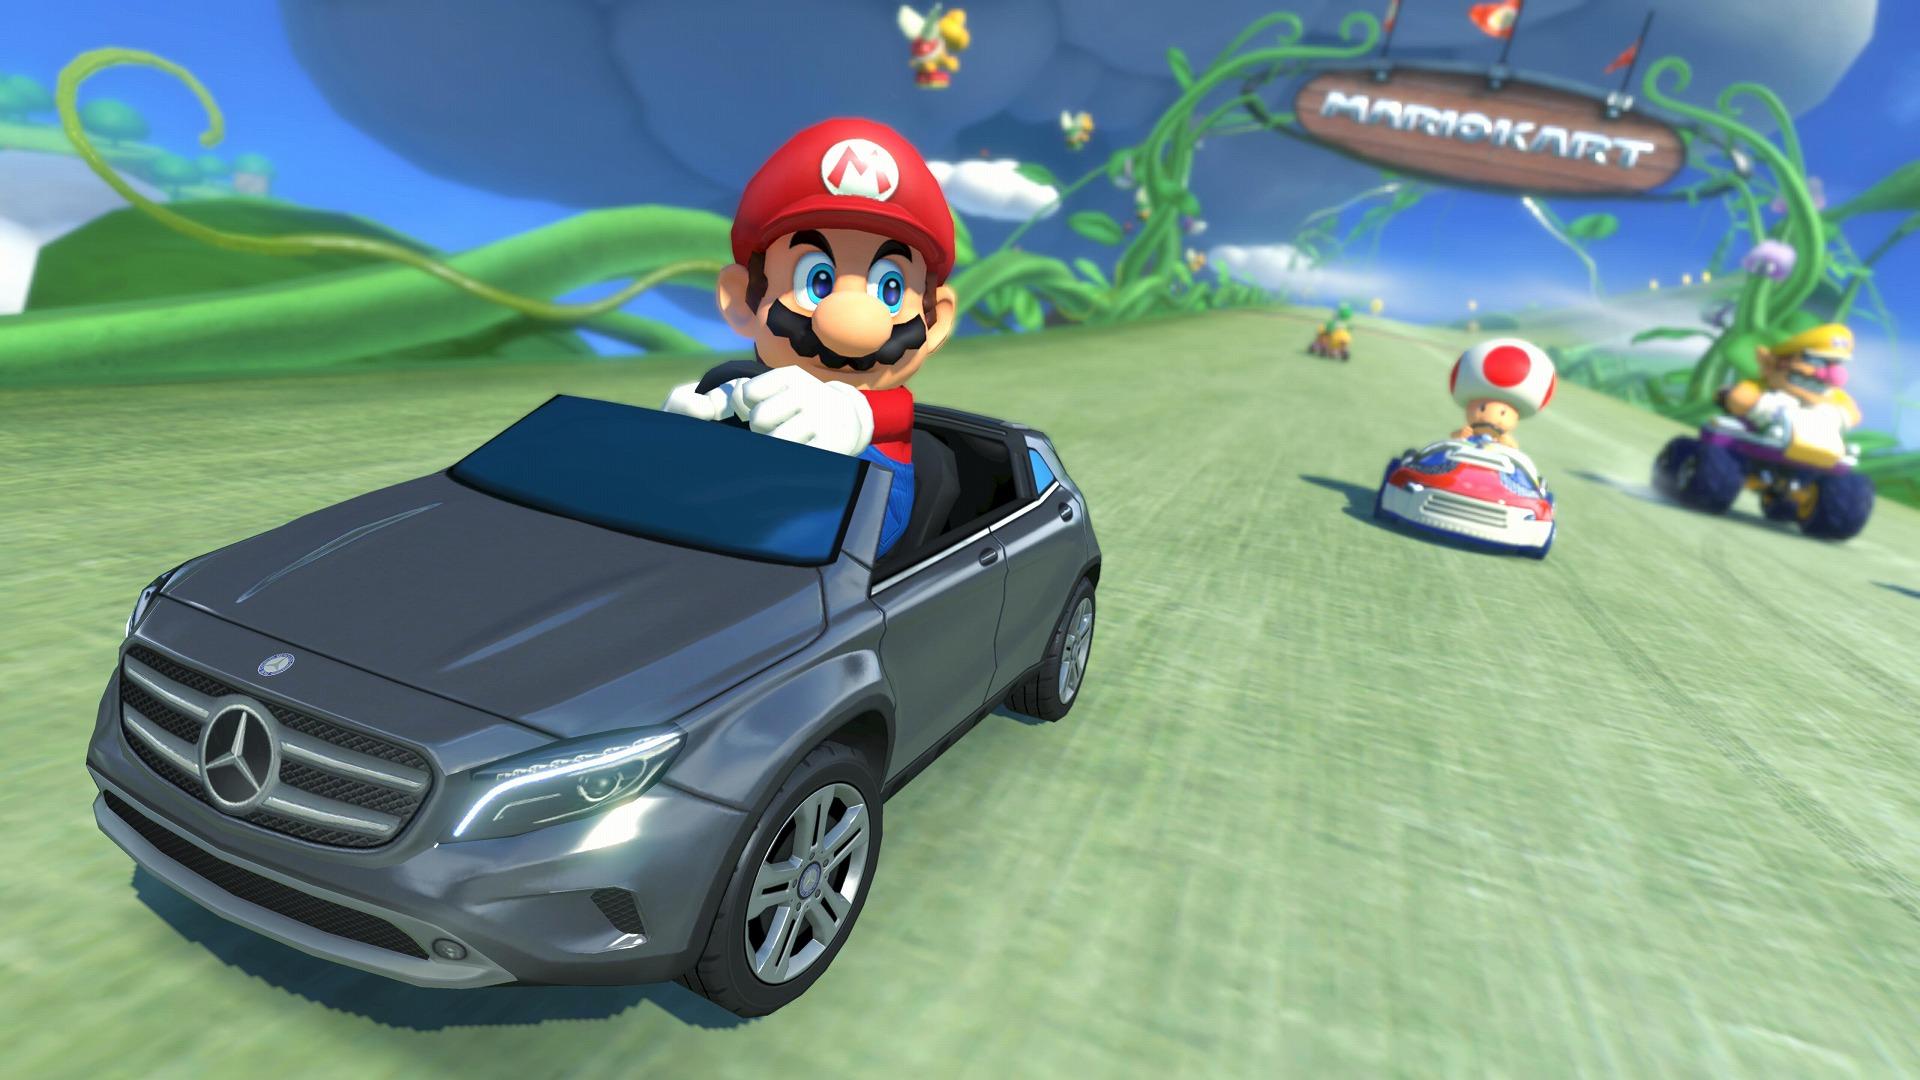 Mario Kart 8 | Wii U - Page 6 Mario_Kart_8-6